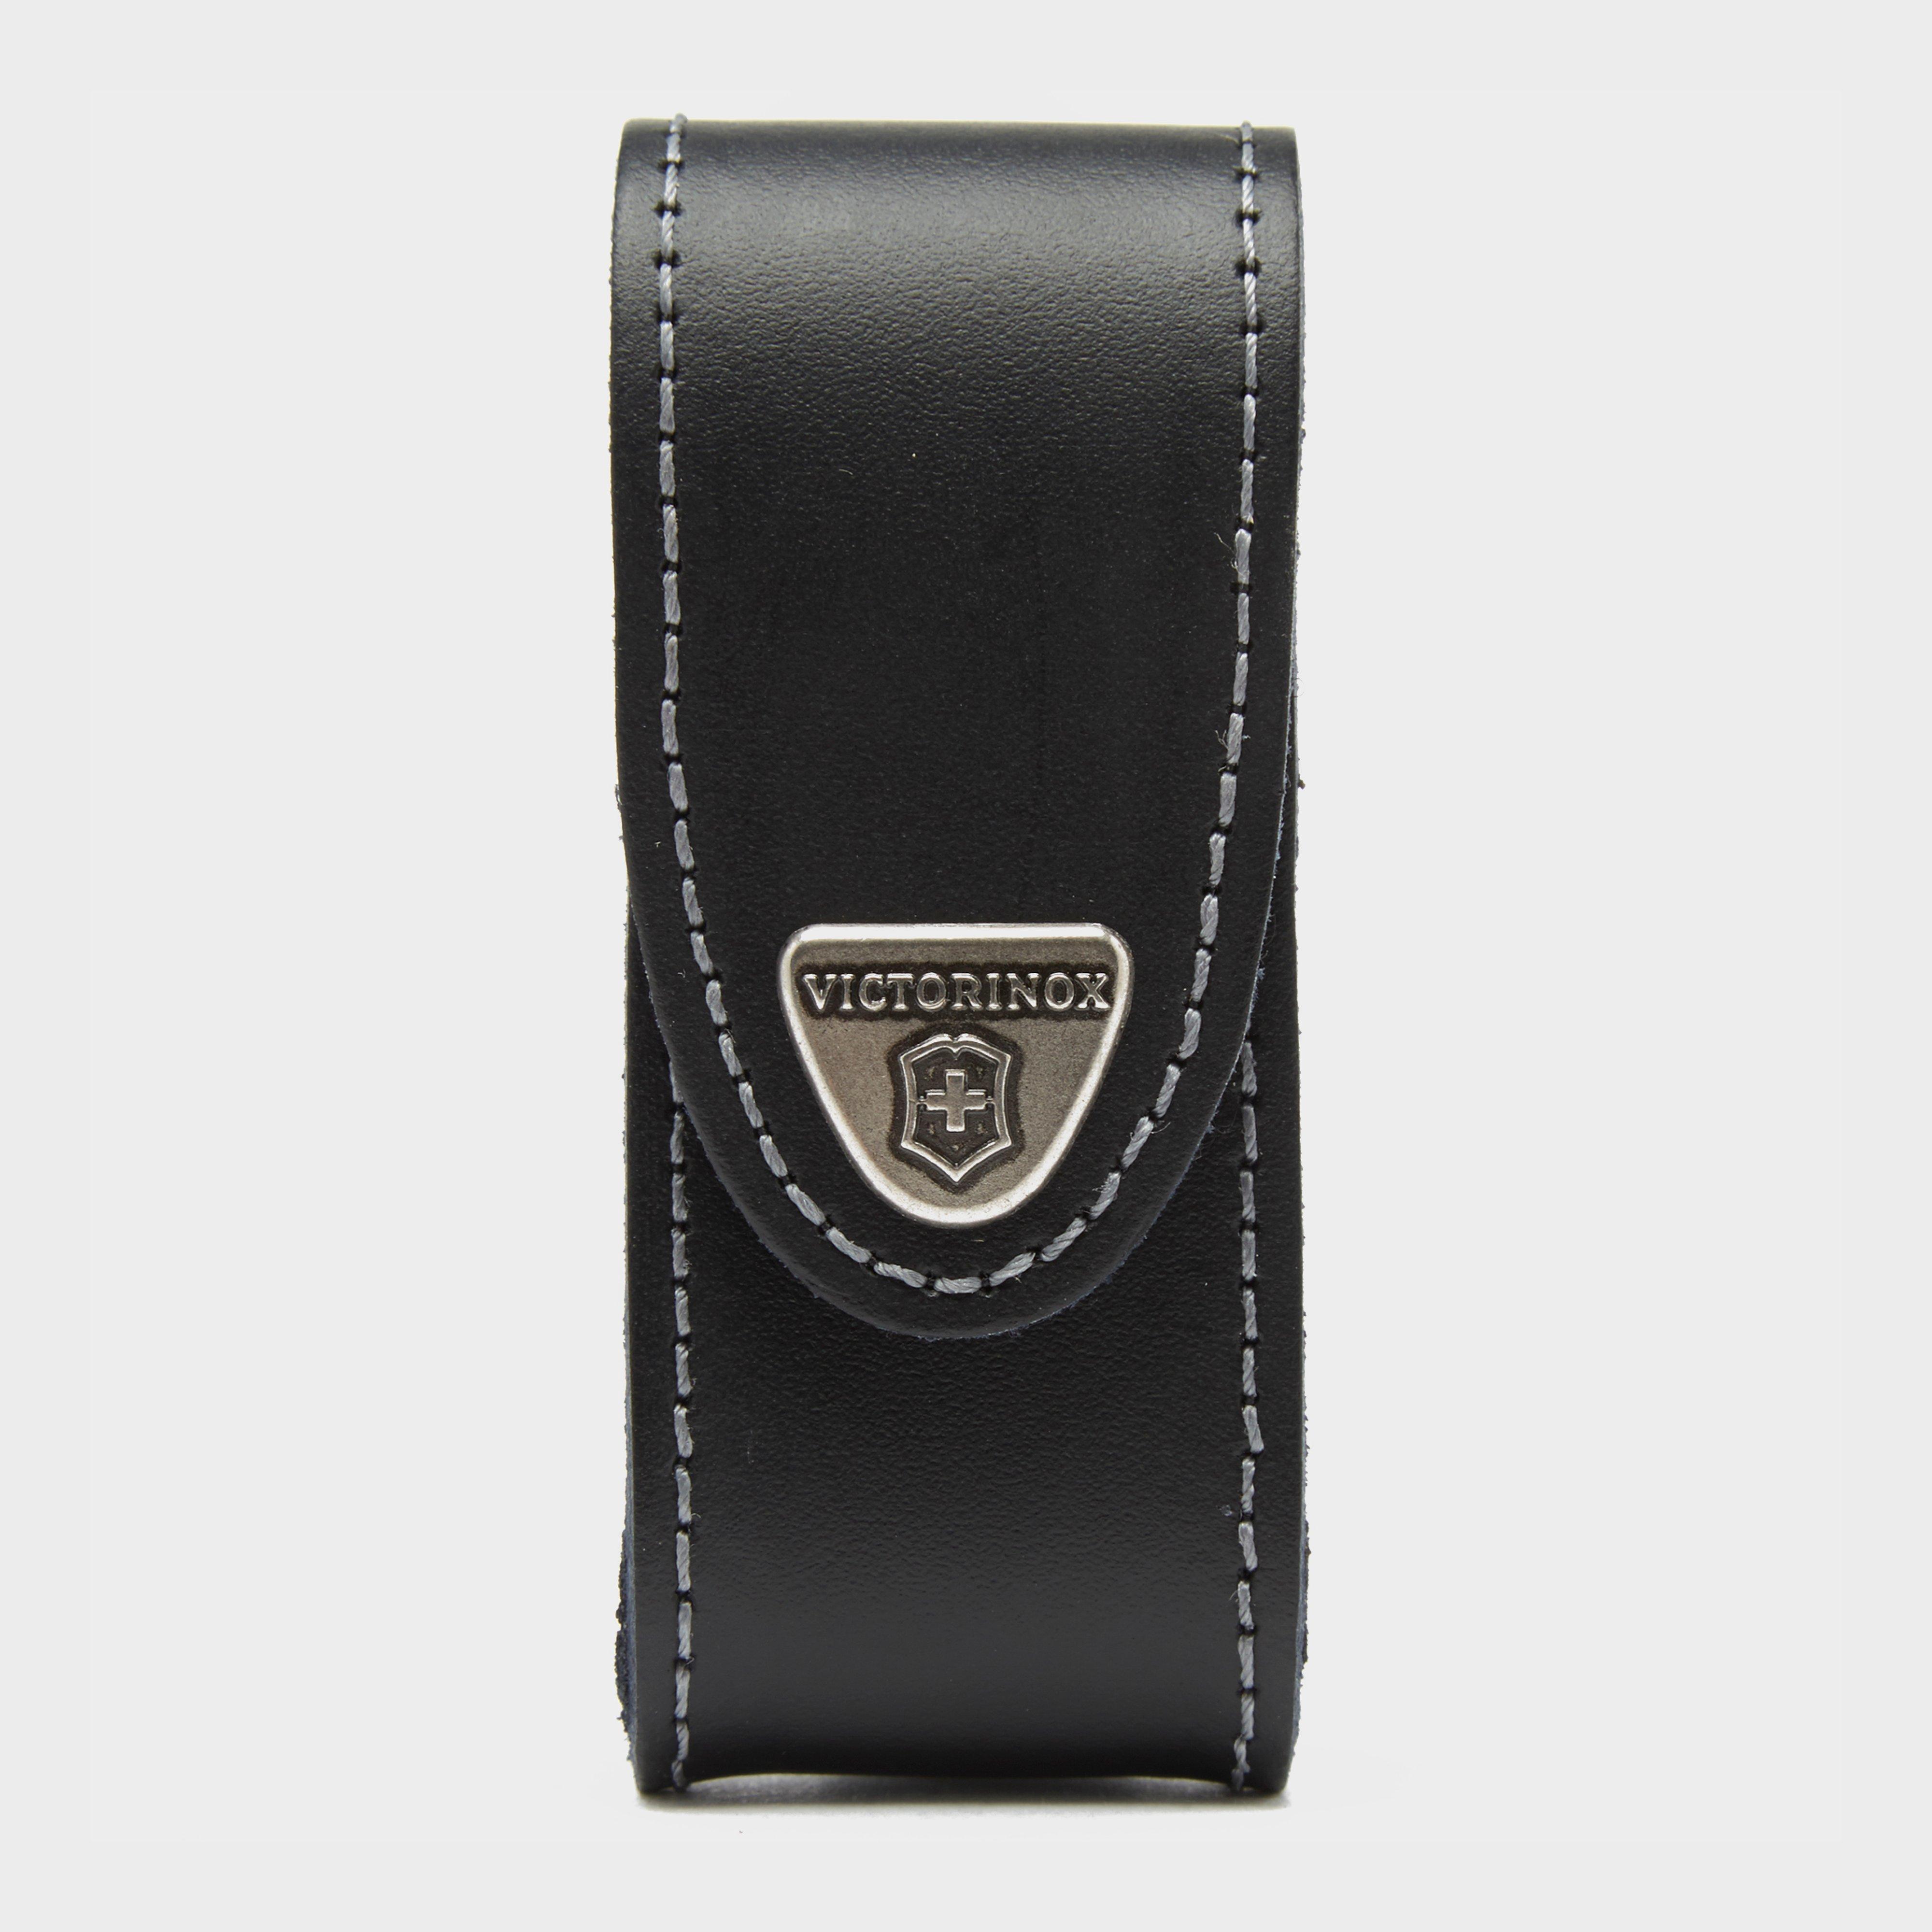 Victorinox Leather Belt Pouch  2-4 Layer - Black/blk  Black/blk